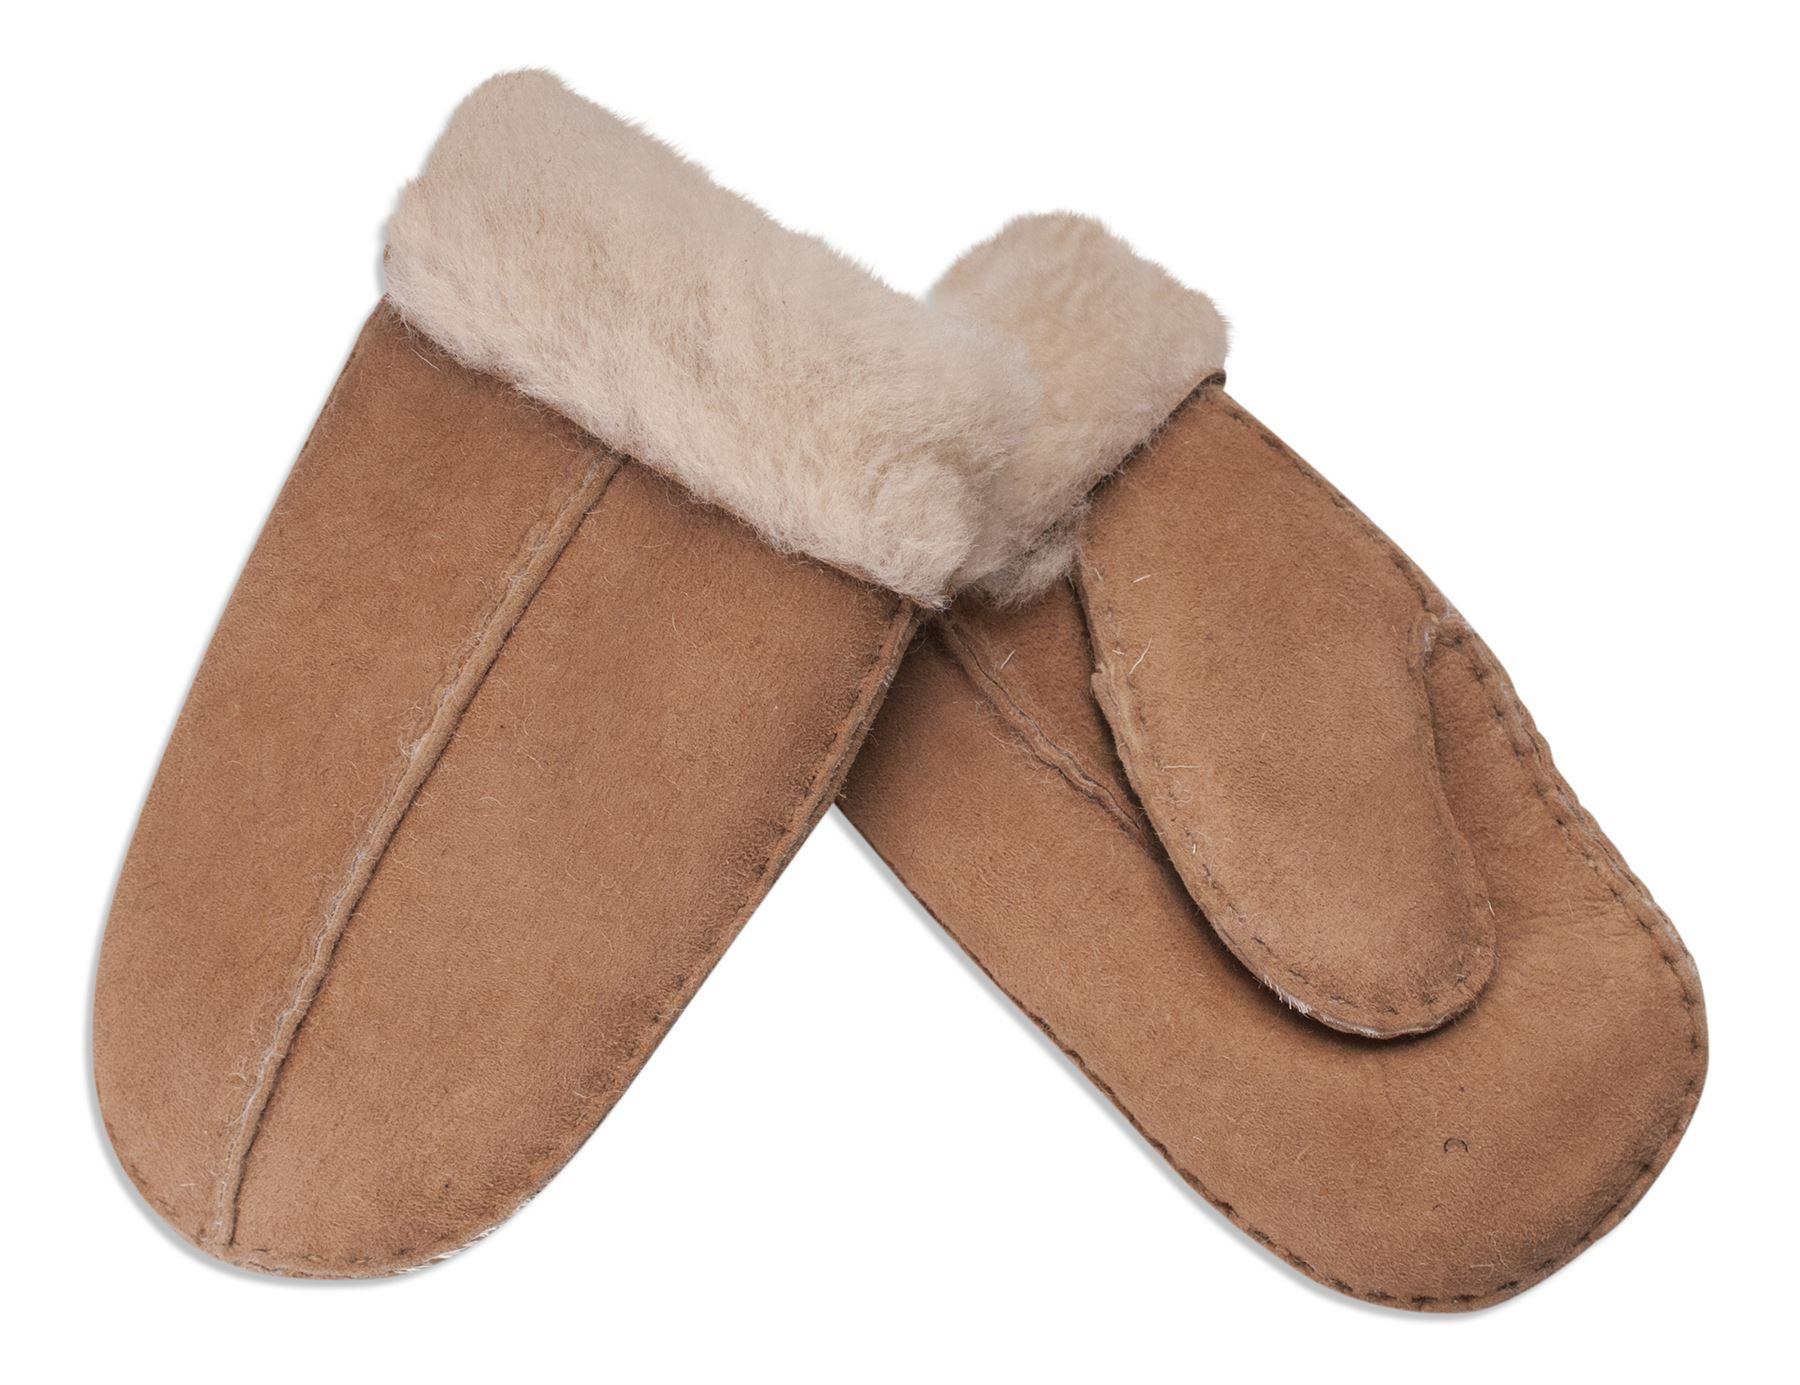 Nordvek Childrens Sheepskin Mittens Kids Winter Gloves 325-100 Split Palm